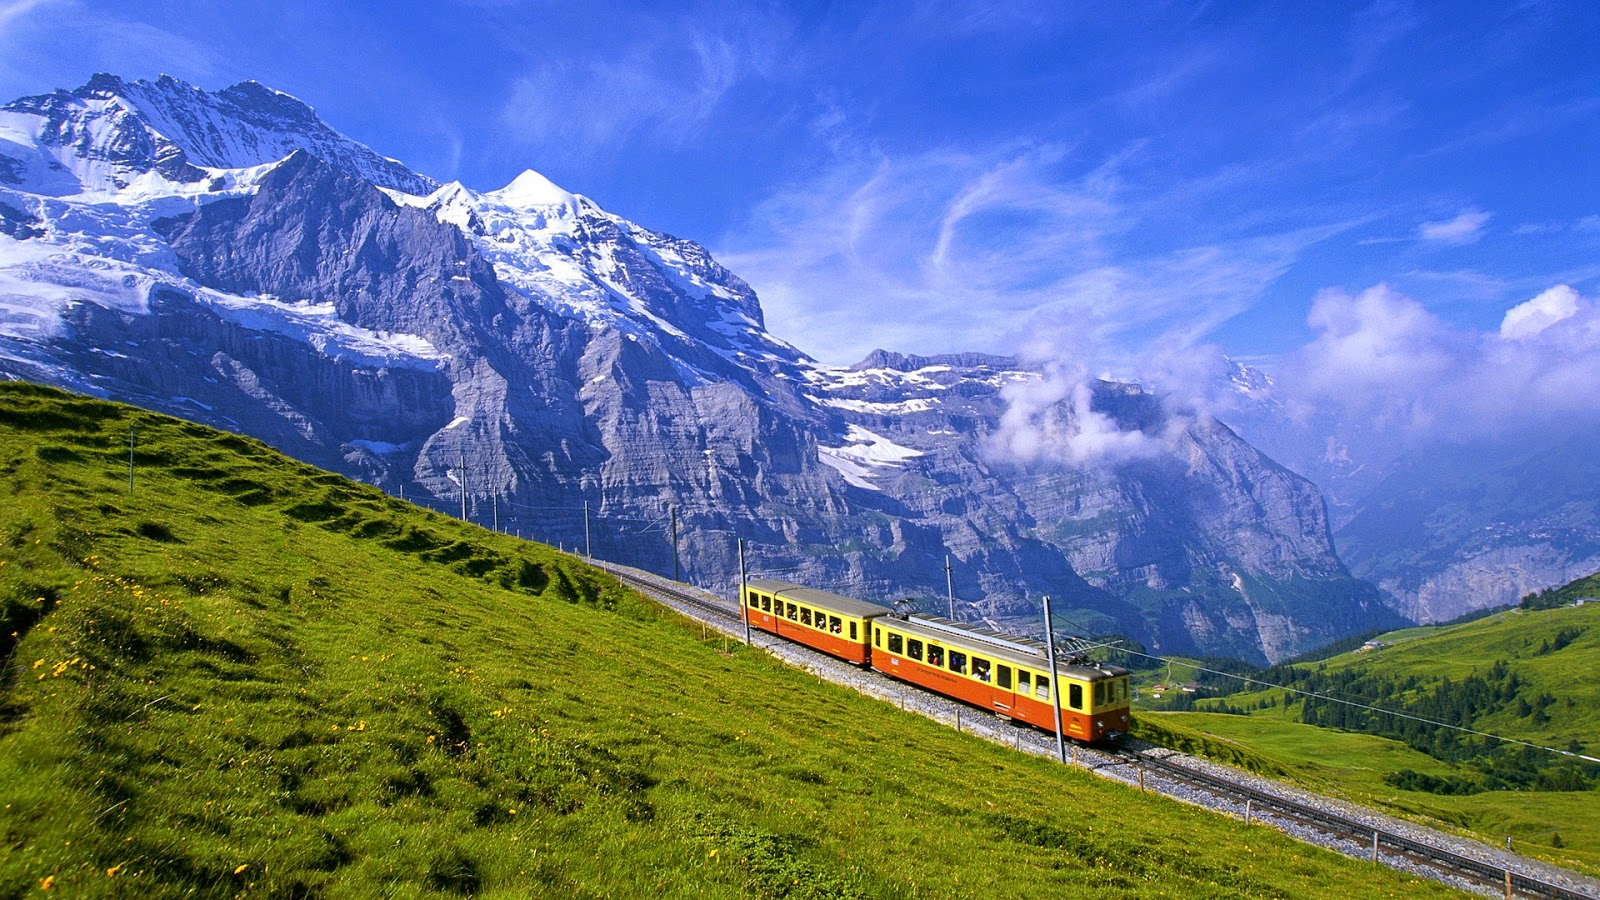 Train in the Landscape